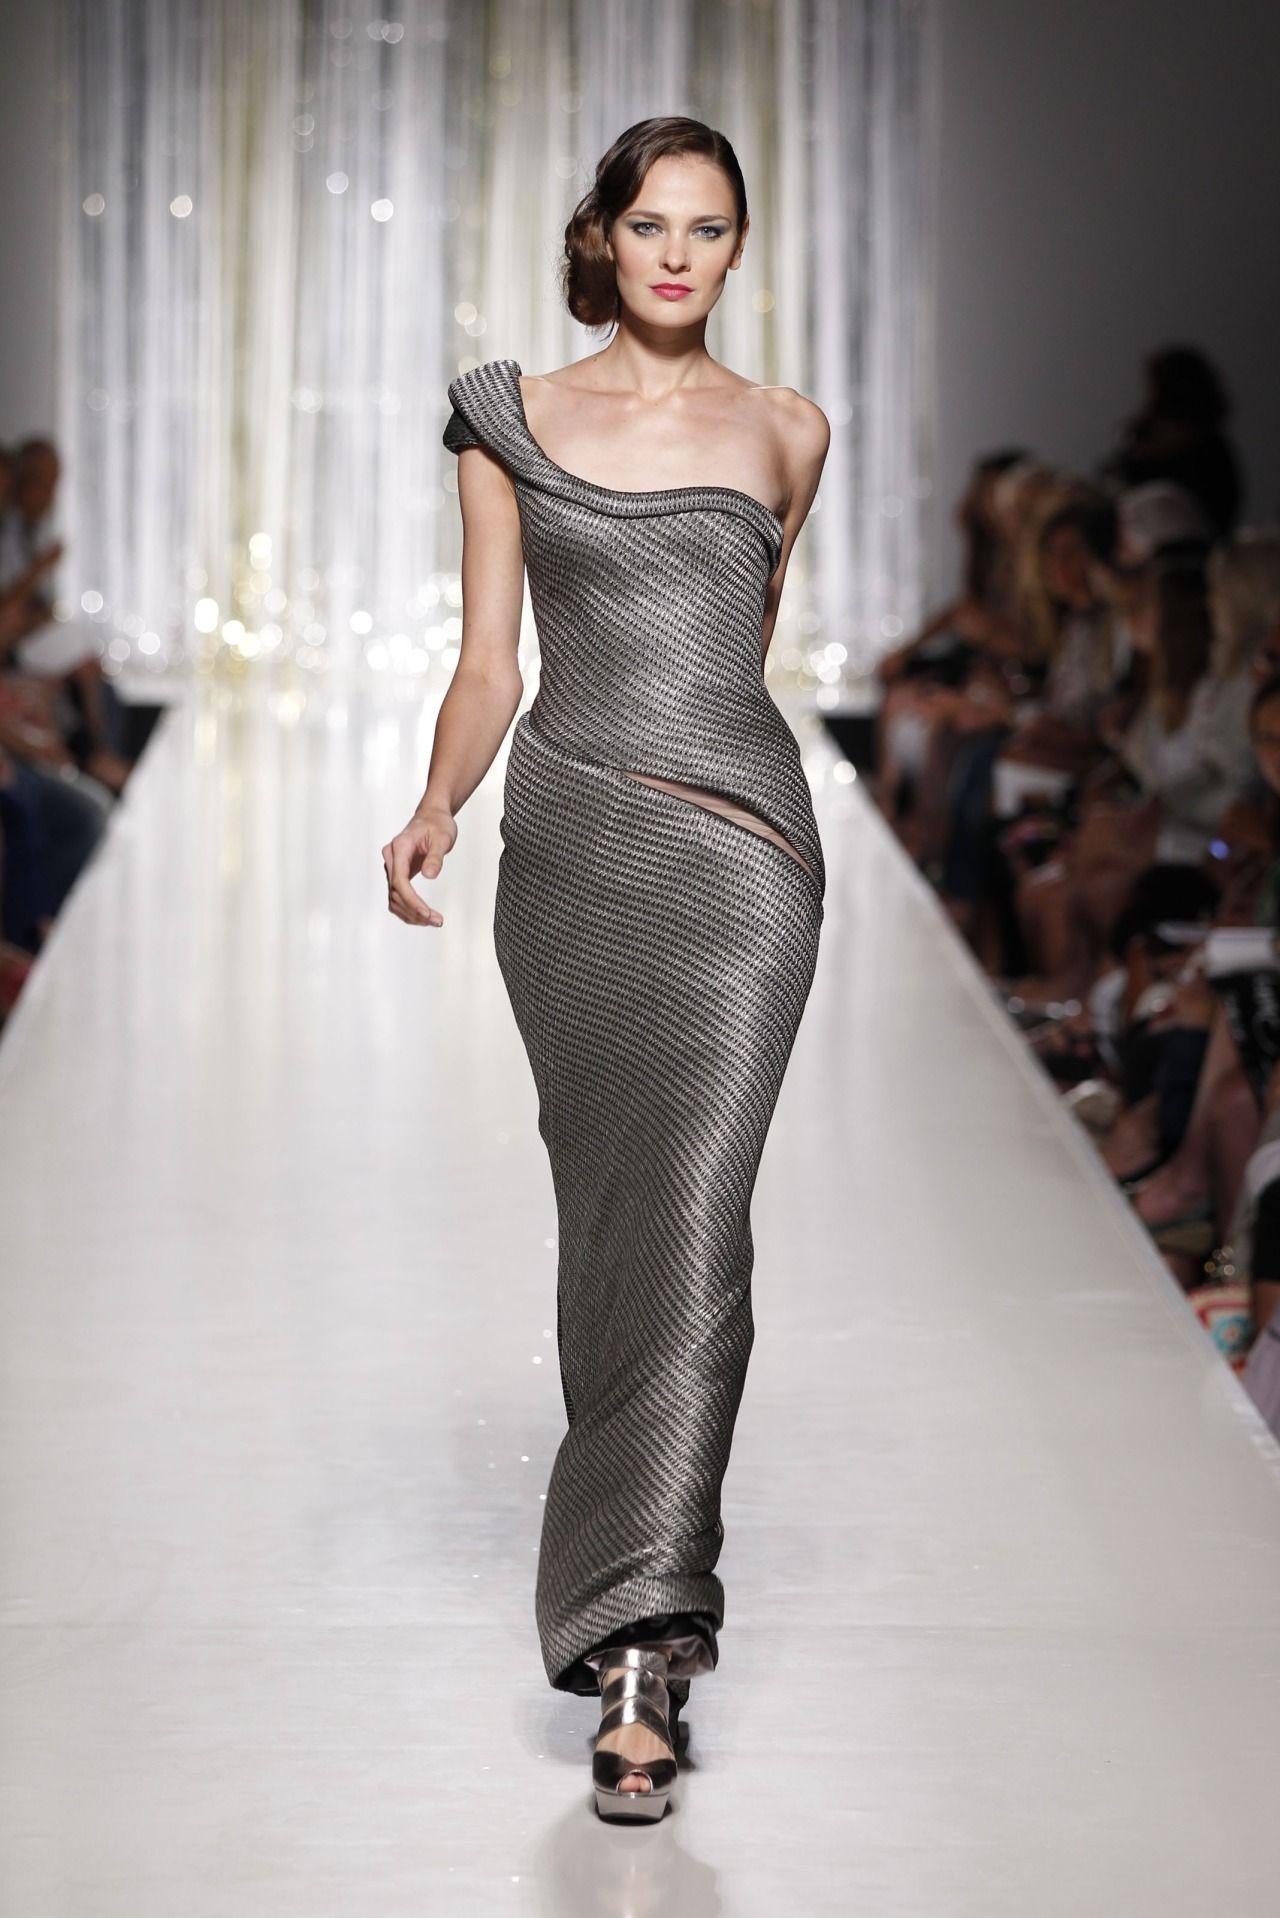 cinderella's stilettos  fashion ready to wear mermaid